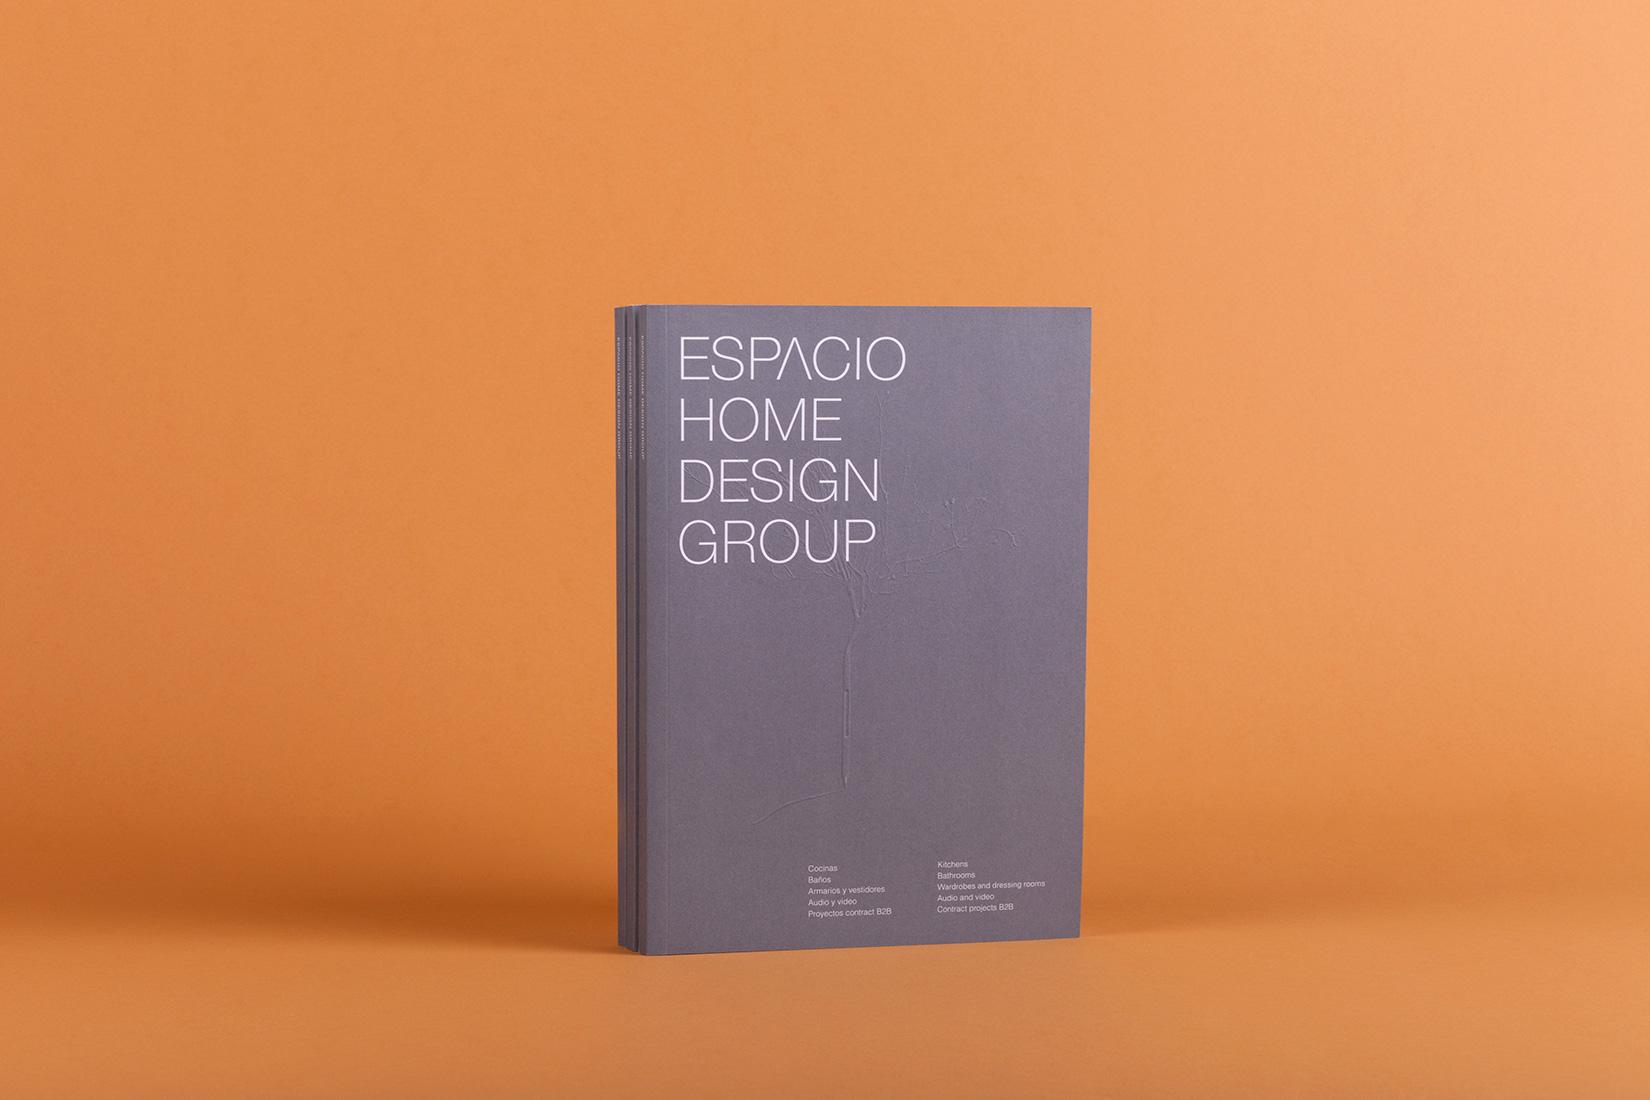 Nuevo Catálogo para Espacio Home Design Group - Enrique Presa ...